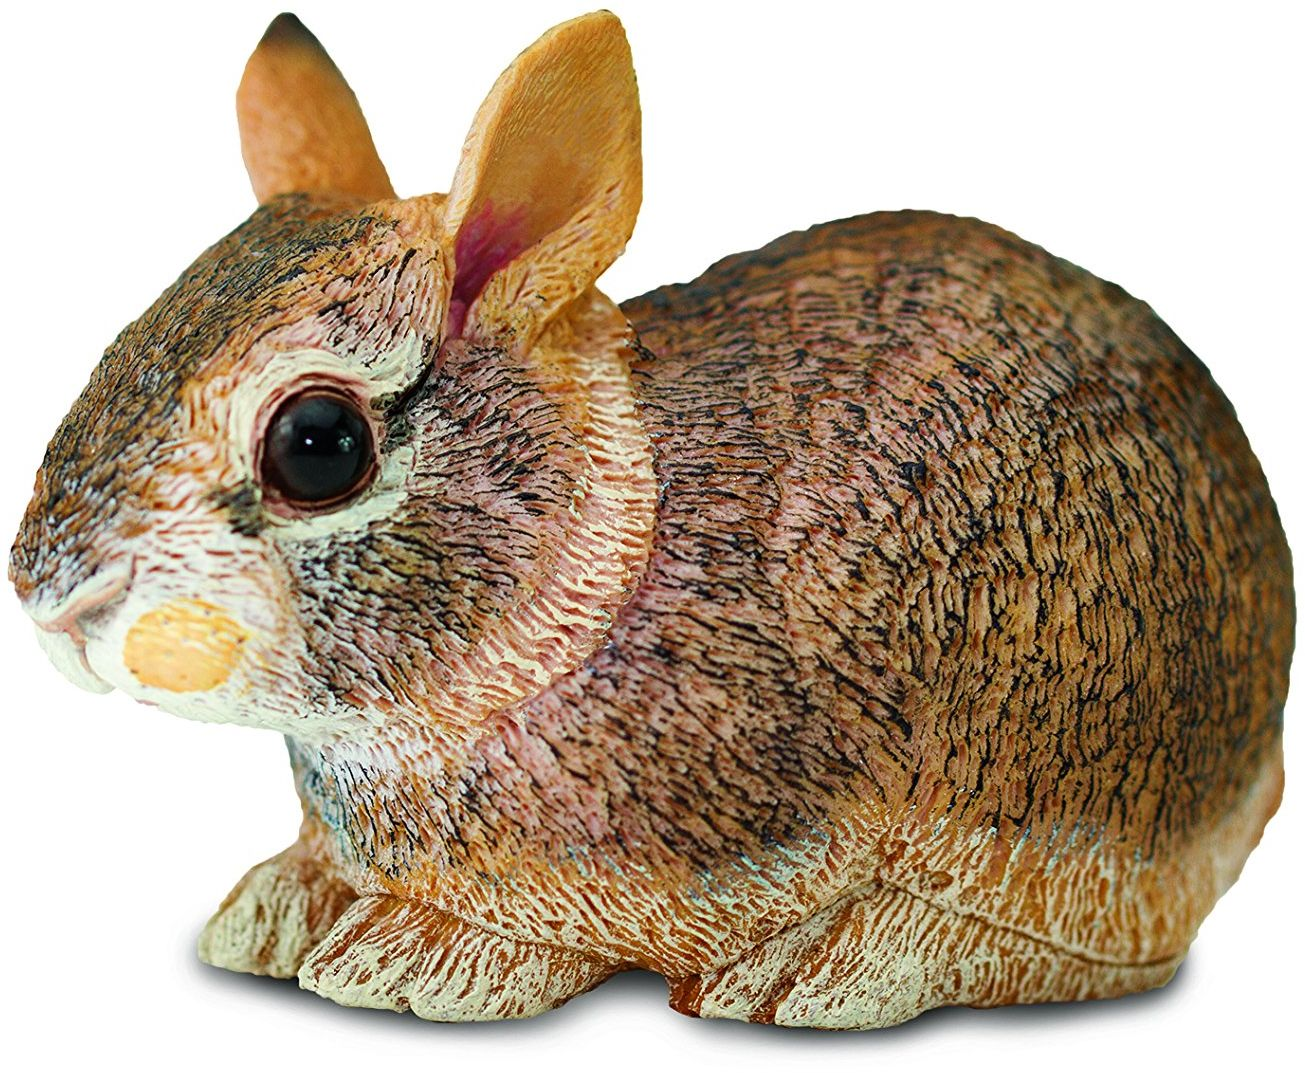 Eastern Cottontail królik dziecko